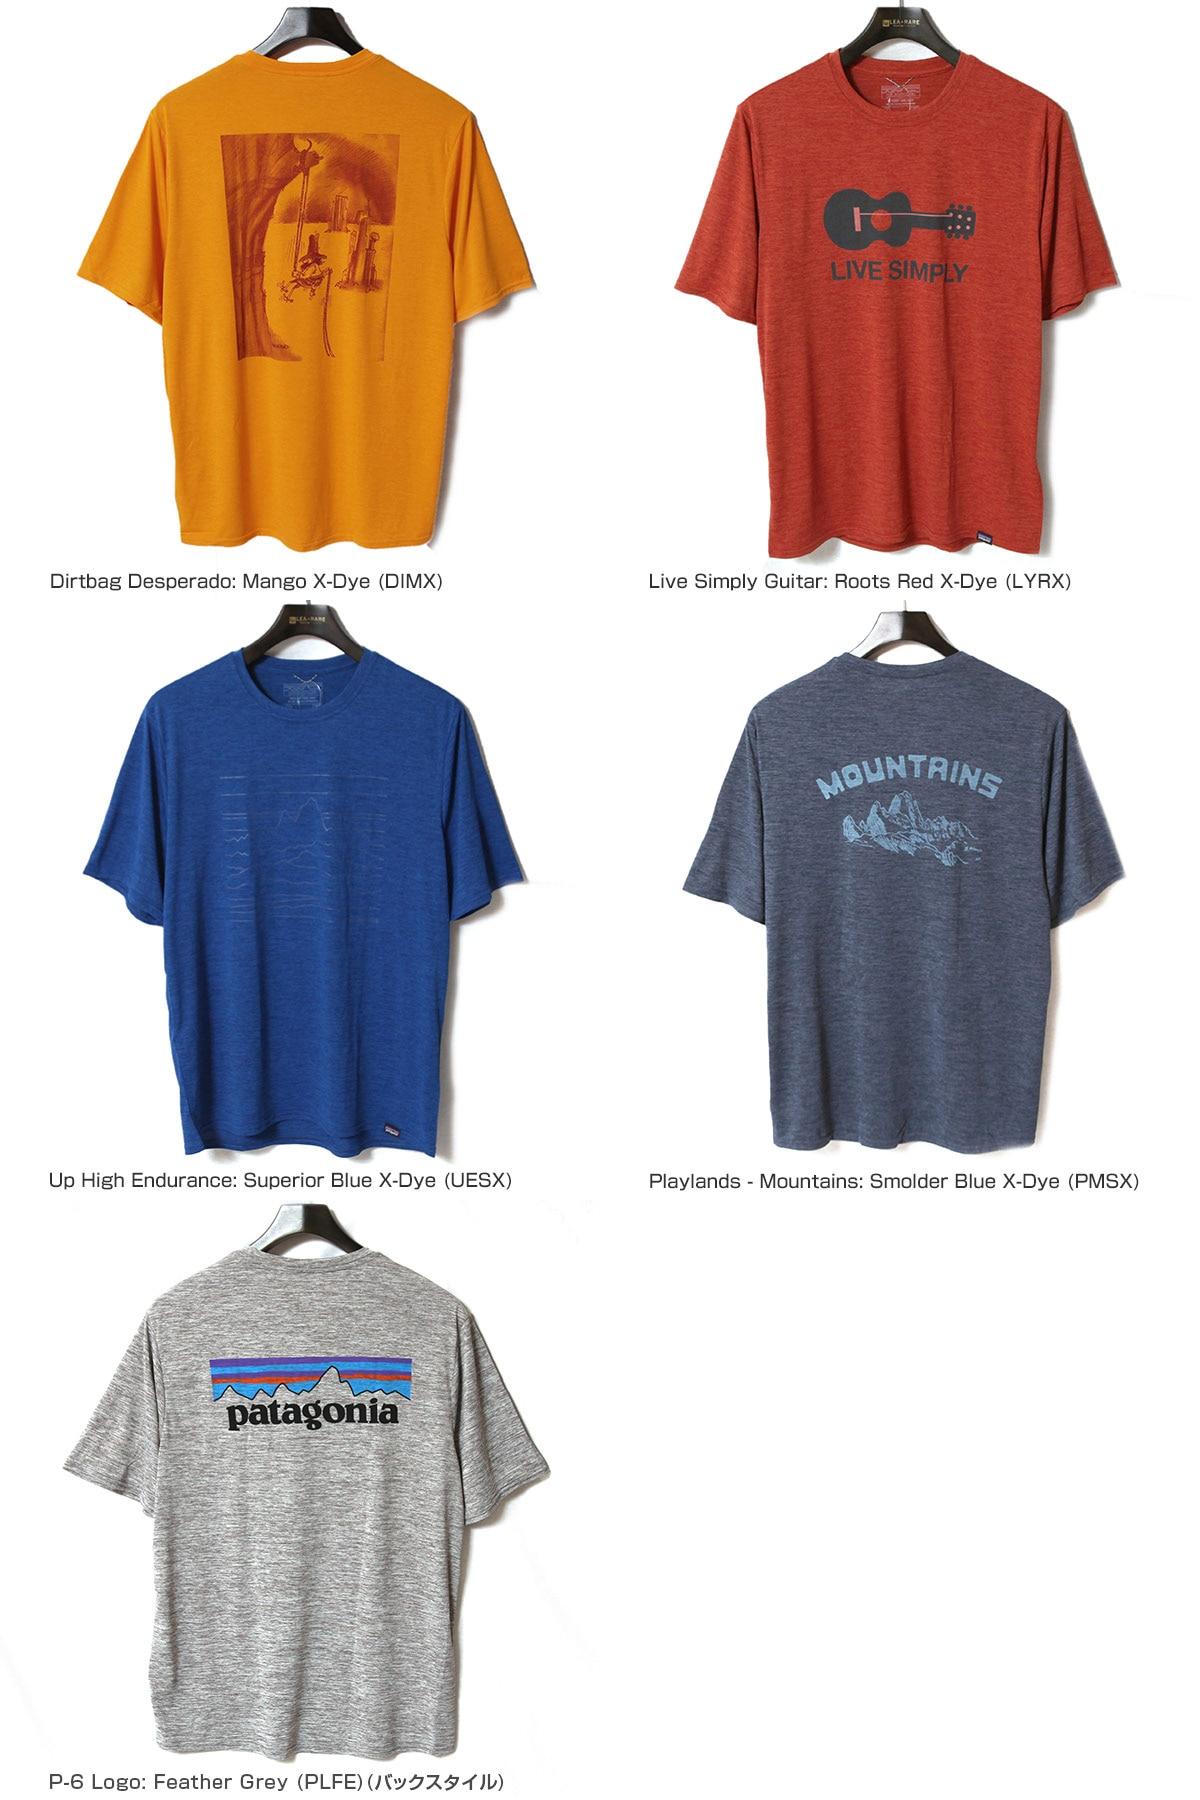 patagonia パタゴニア メンズ・キャプリーン・クール・デイリー・グラフィック・シャツ 半袖Tシャツ 45235